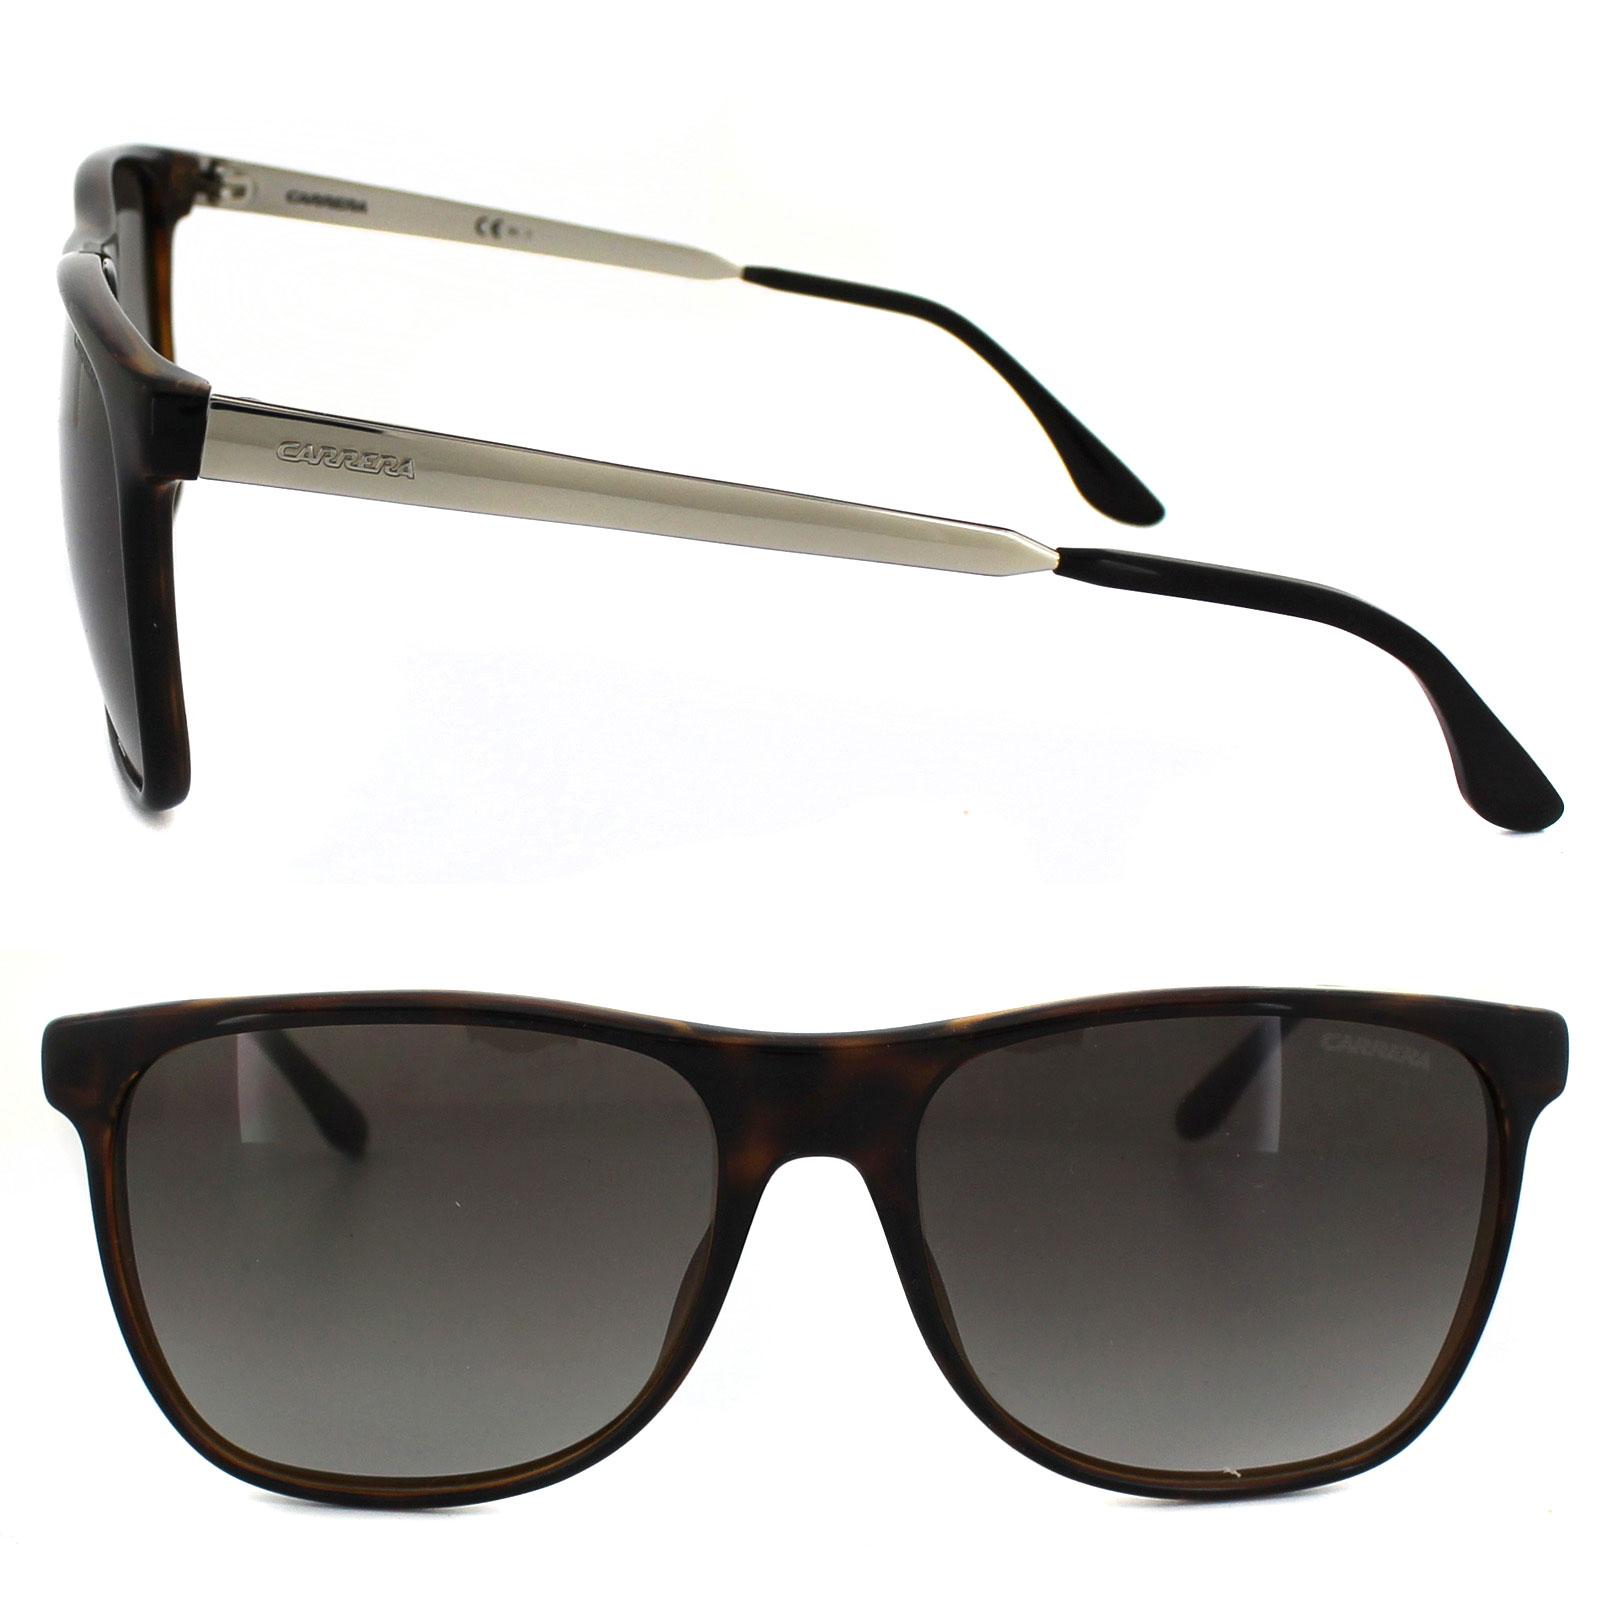 Cheap Carrera Carrera 6011 Sunglasses Discounted Sunglasses